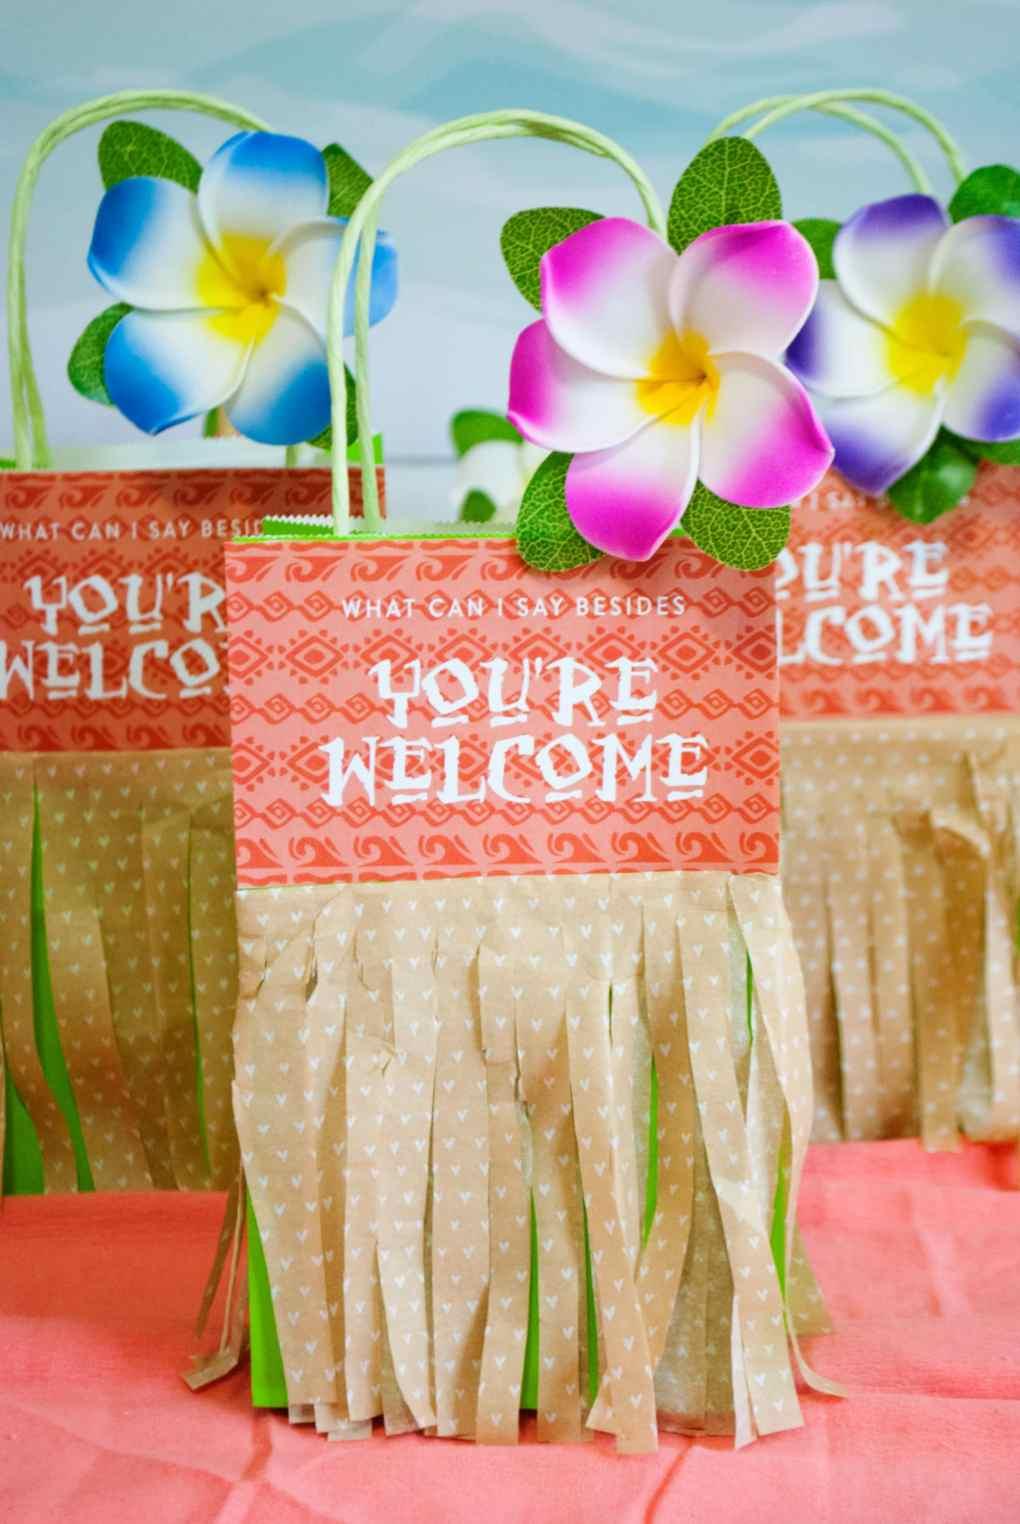 Moana Birthday Party Ideas Gift Bags - Project Nursery